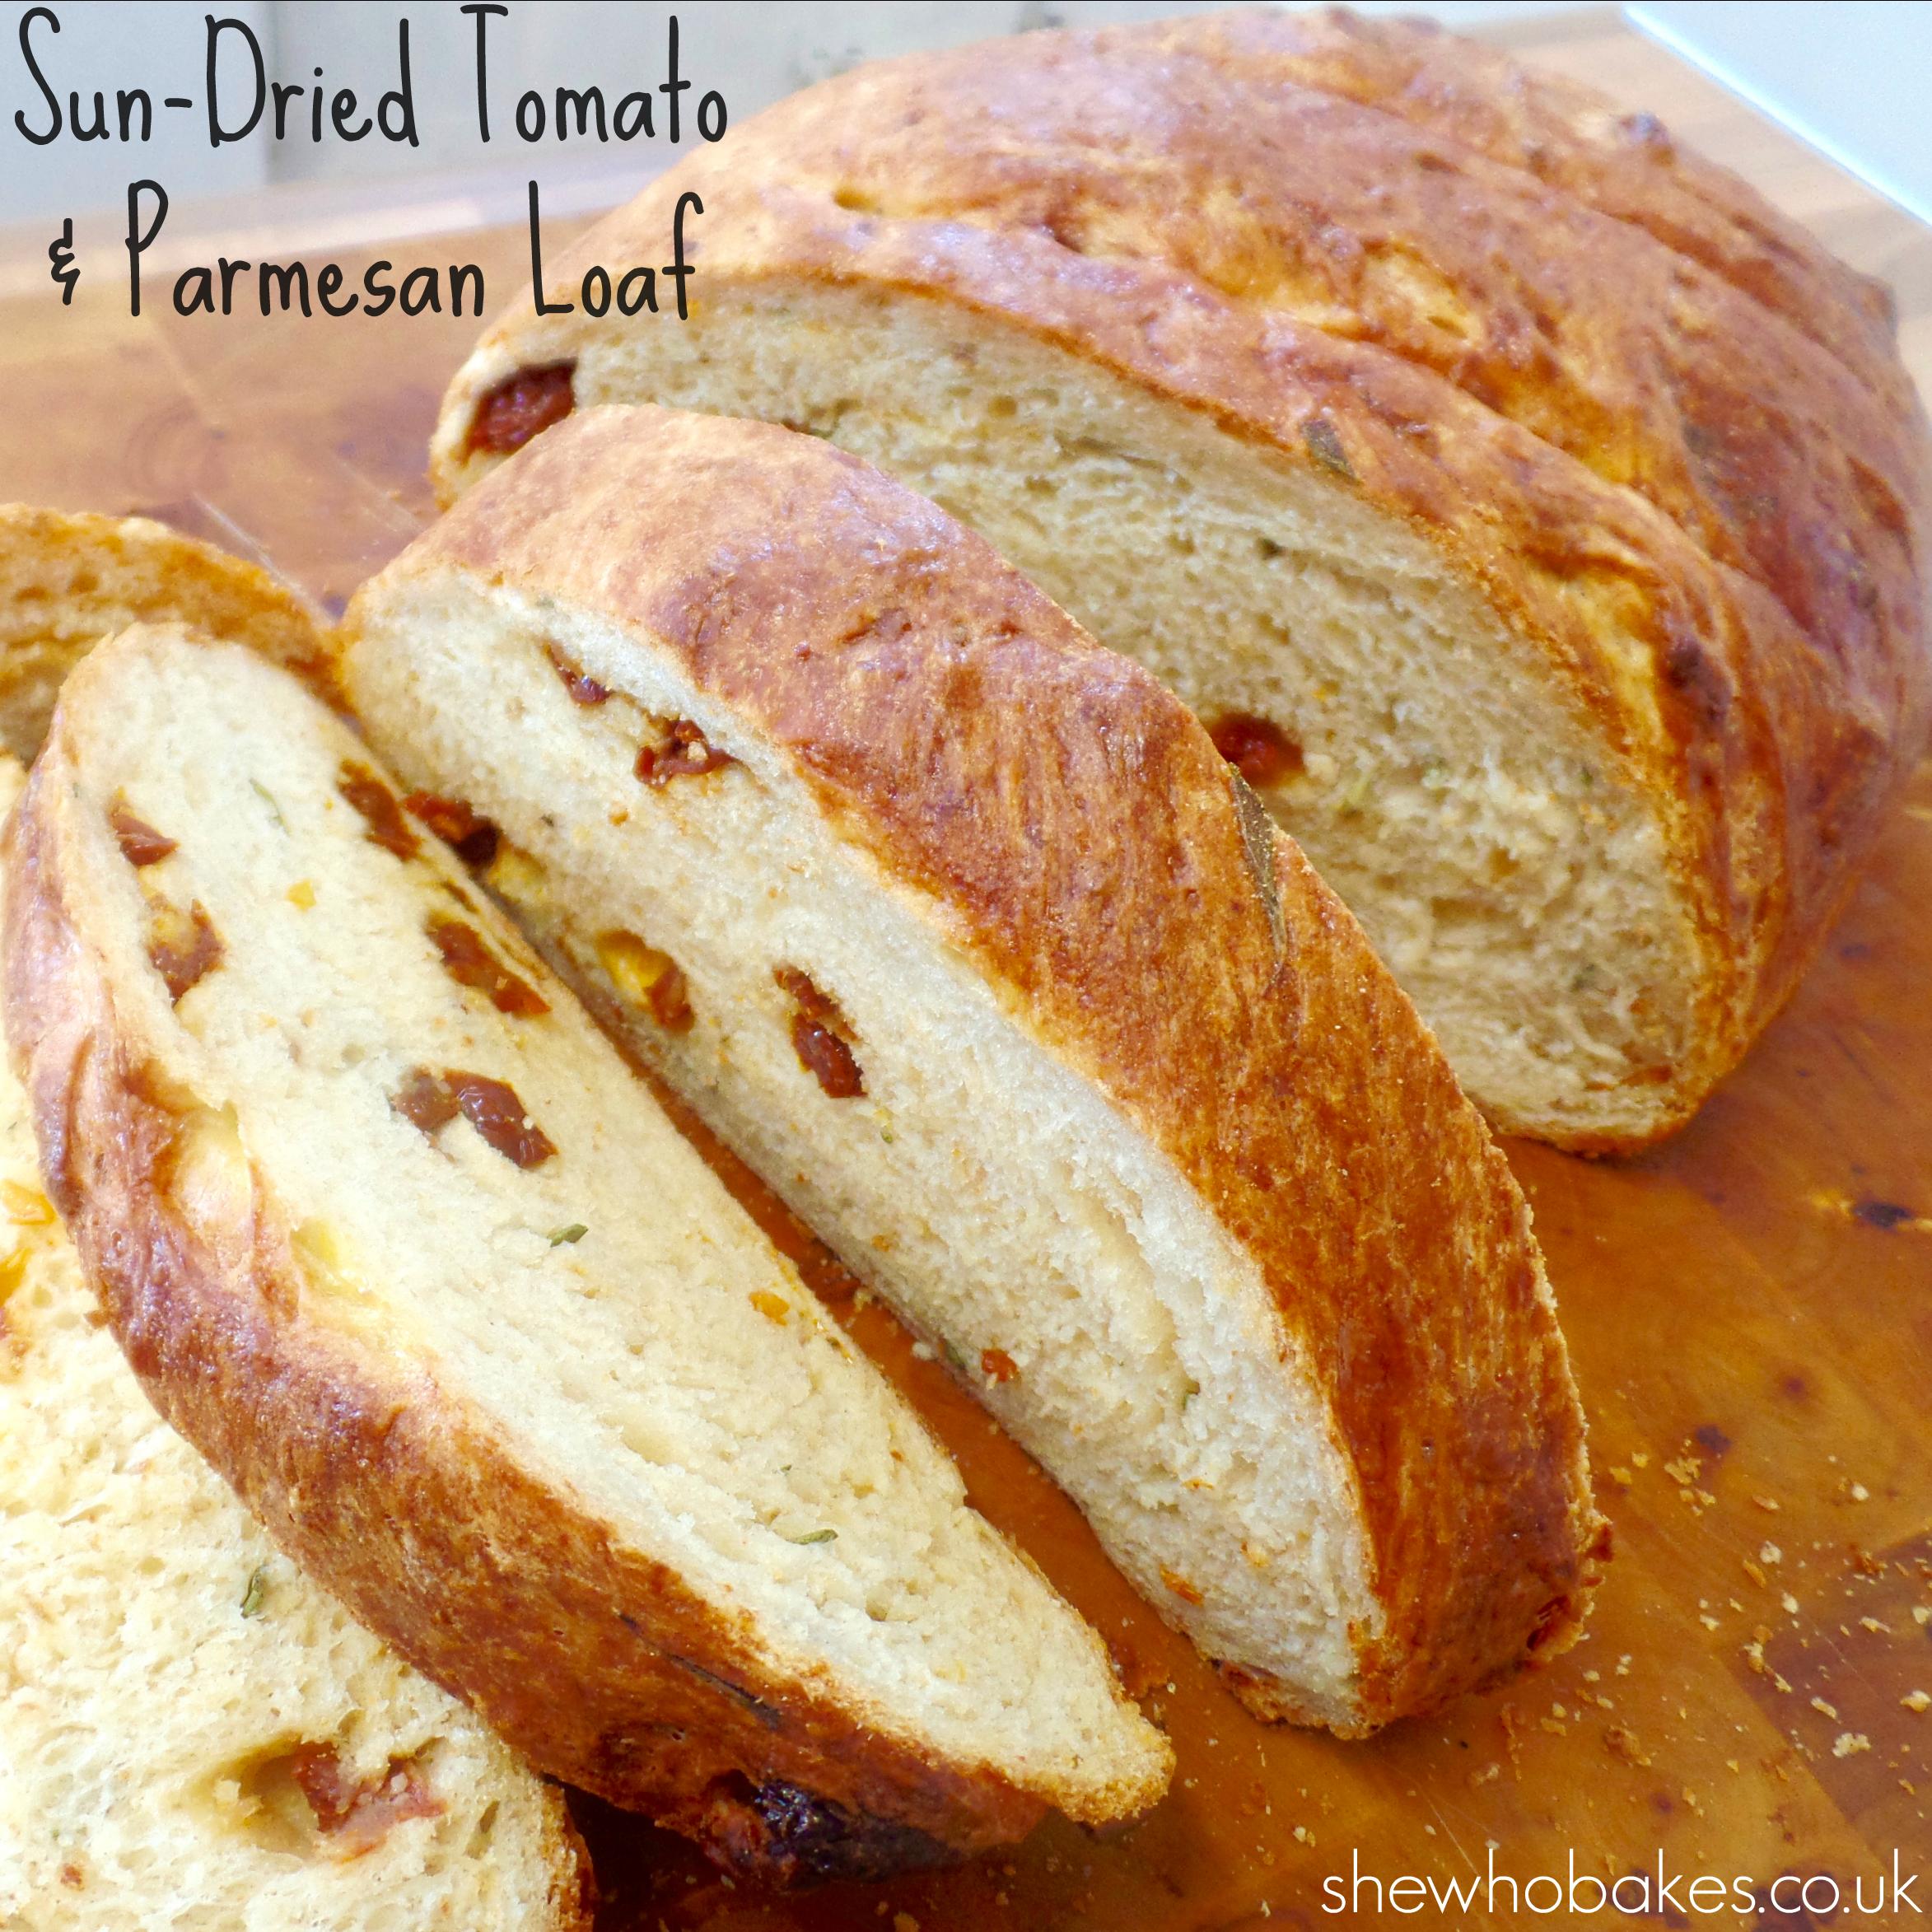 Sun-Dried Tomato & Parmesan Loaf